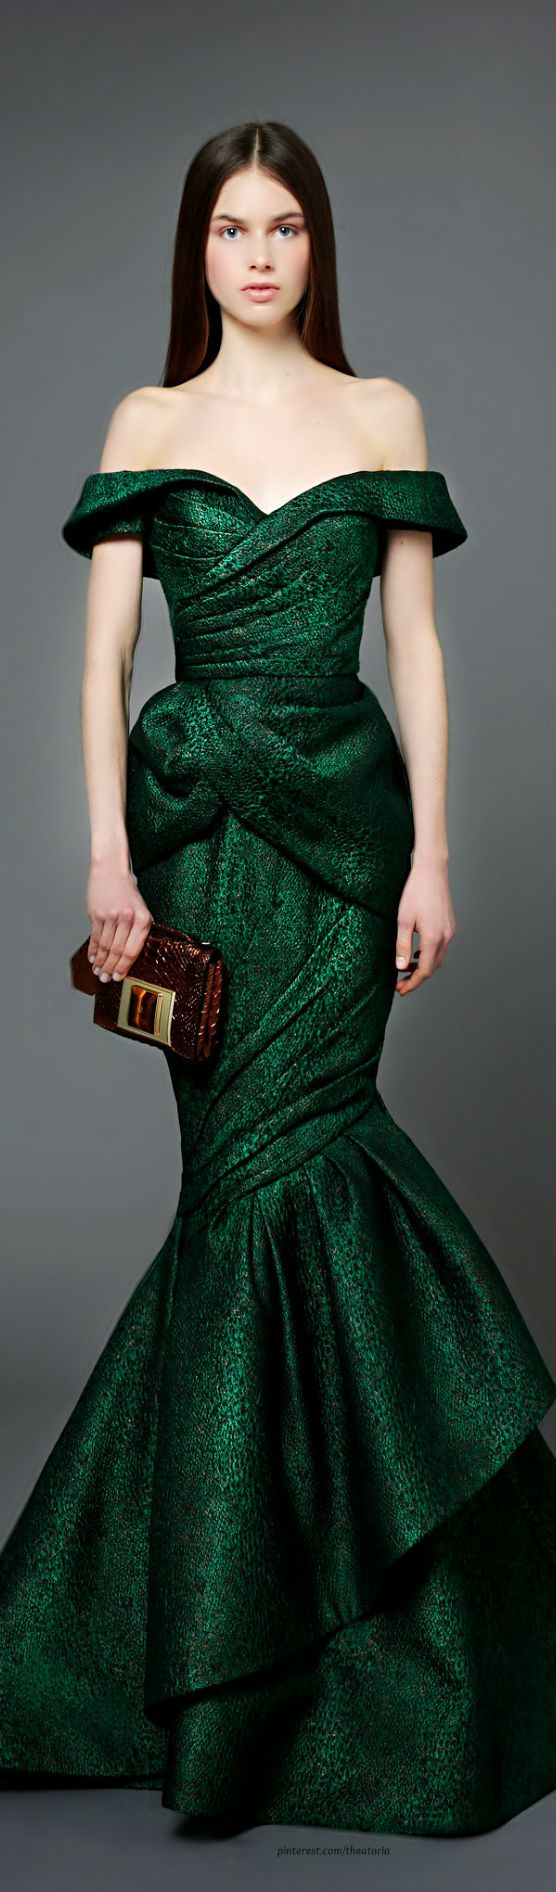 Gorgeous green prom dress  Edel Dunkles Flaschengrün Farbpassnummer  Kerstin Tomancok